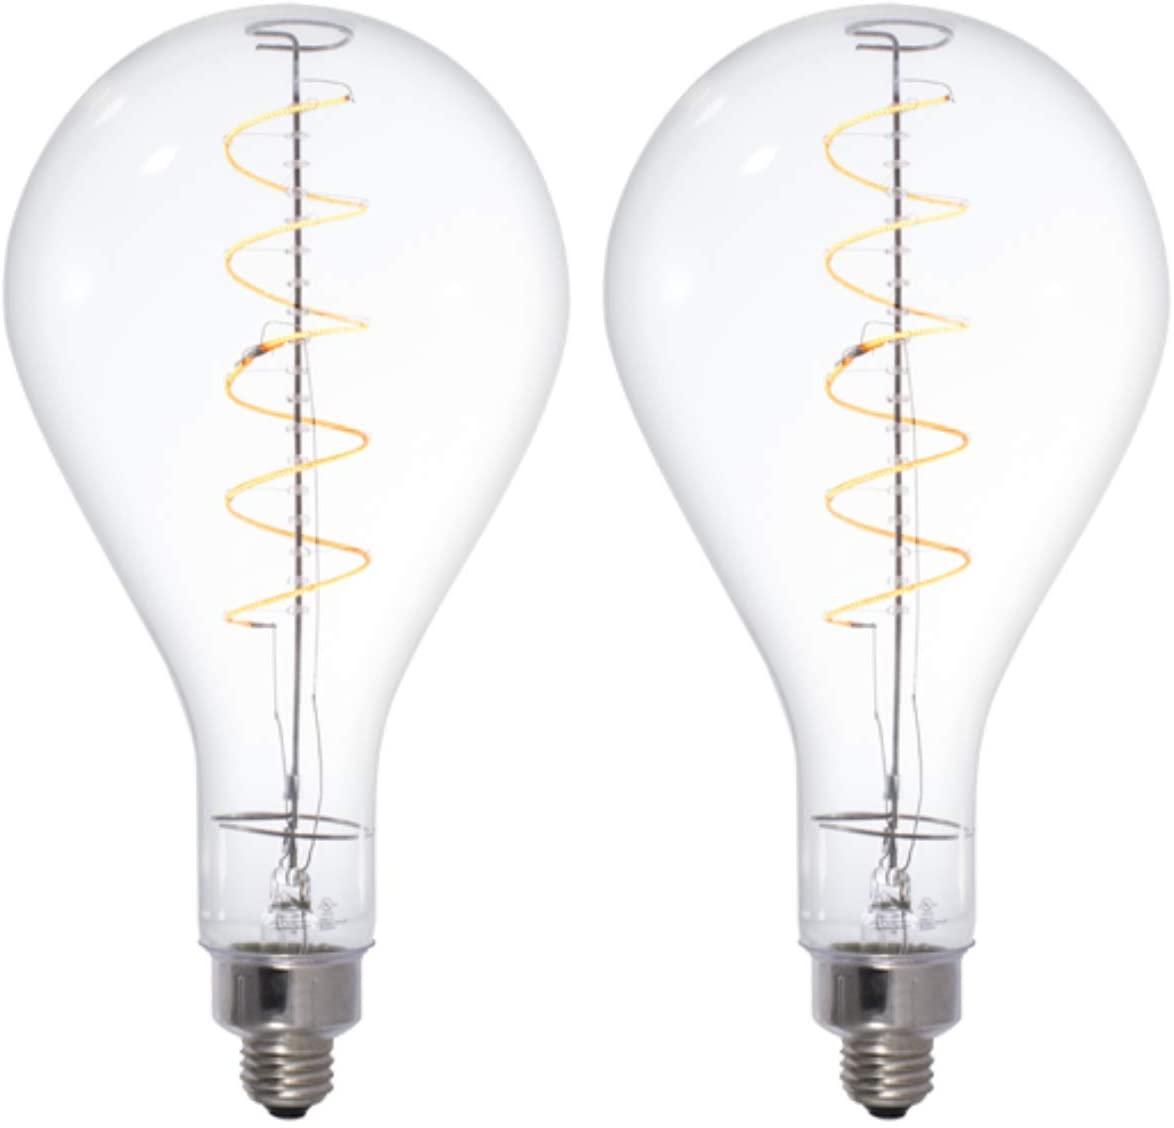 4 Watt Grand Nostalgic Standard Light Bulbs | 60W Equivalent LED Medium E26 Base 2200K Warm White PS52 | 200 Lumens 15000 Average Lifespan | 2 Pack by GoodBulb